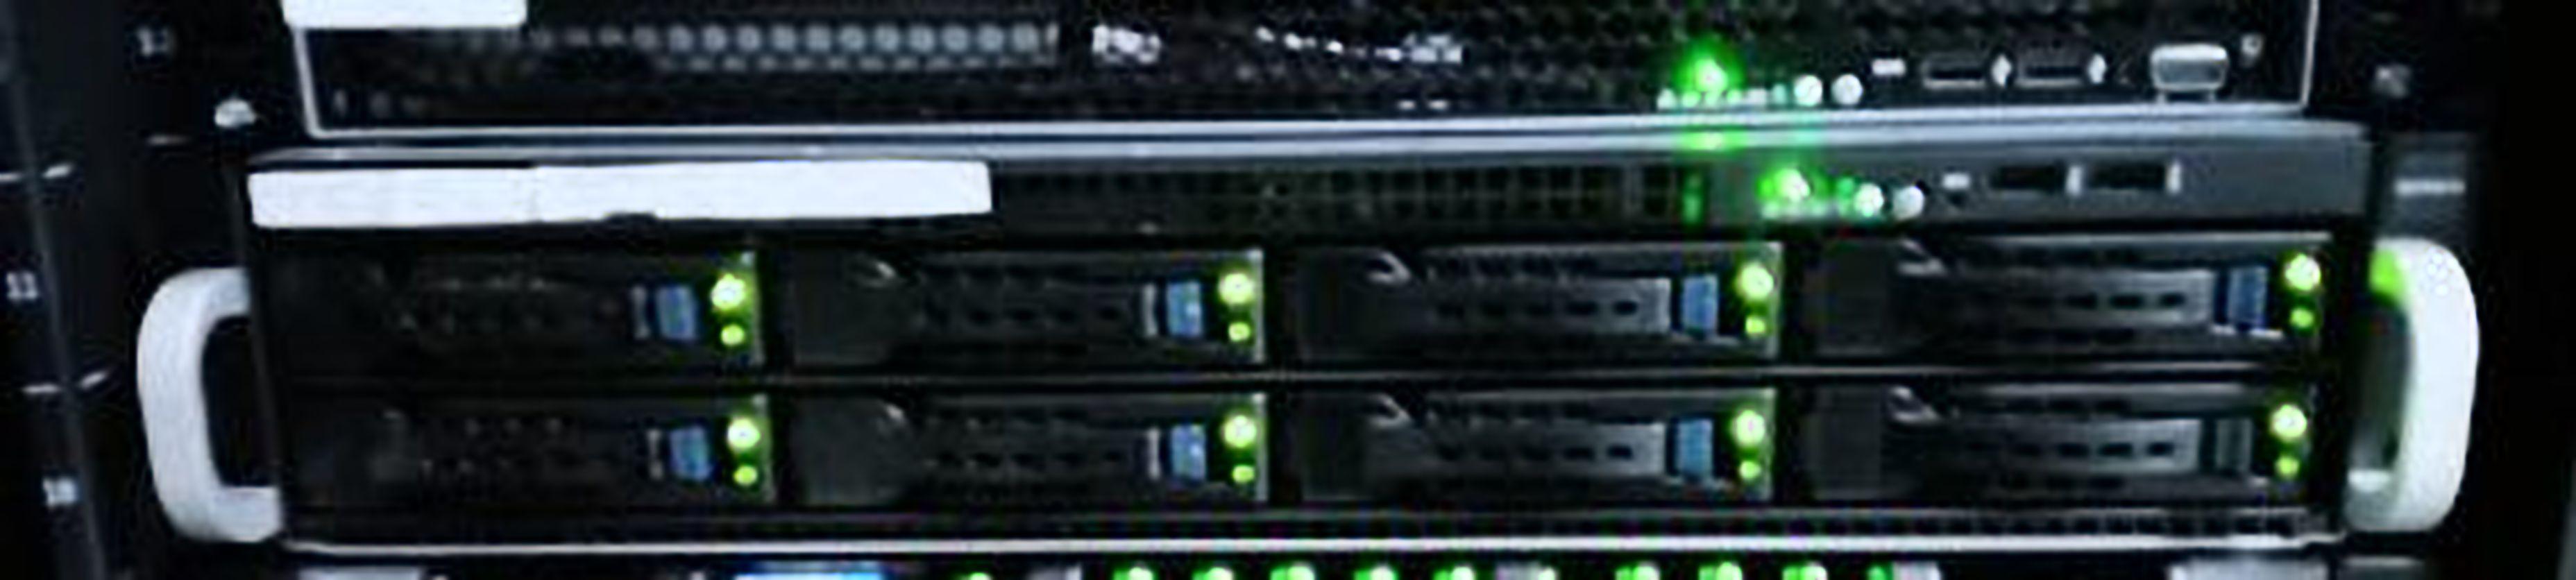 ComputeServer